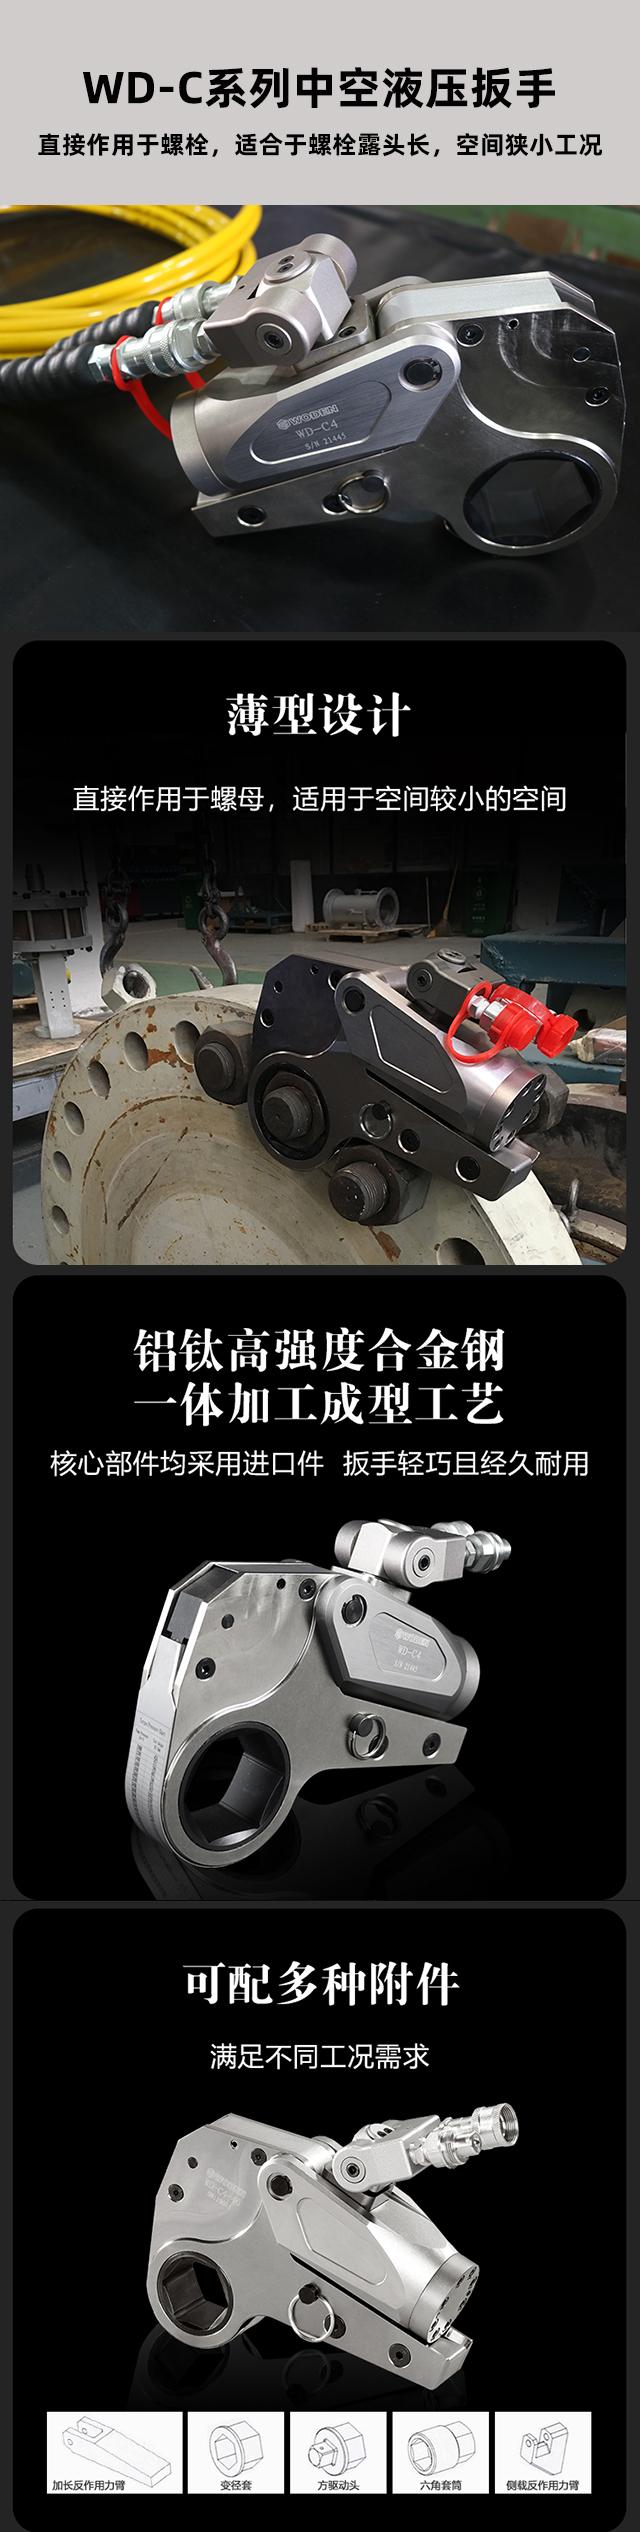 WD-C系列中空LOL雷电竞雷电竞备用网站介绍